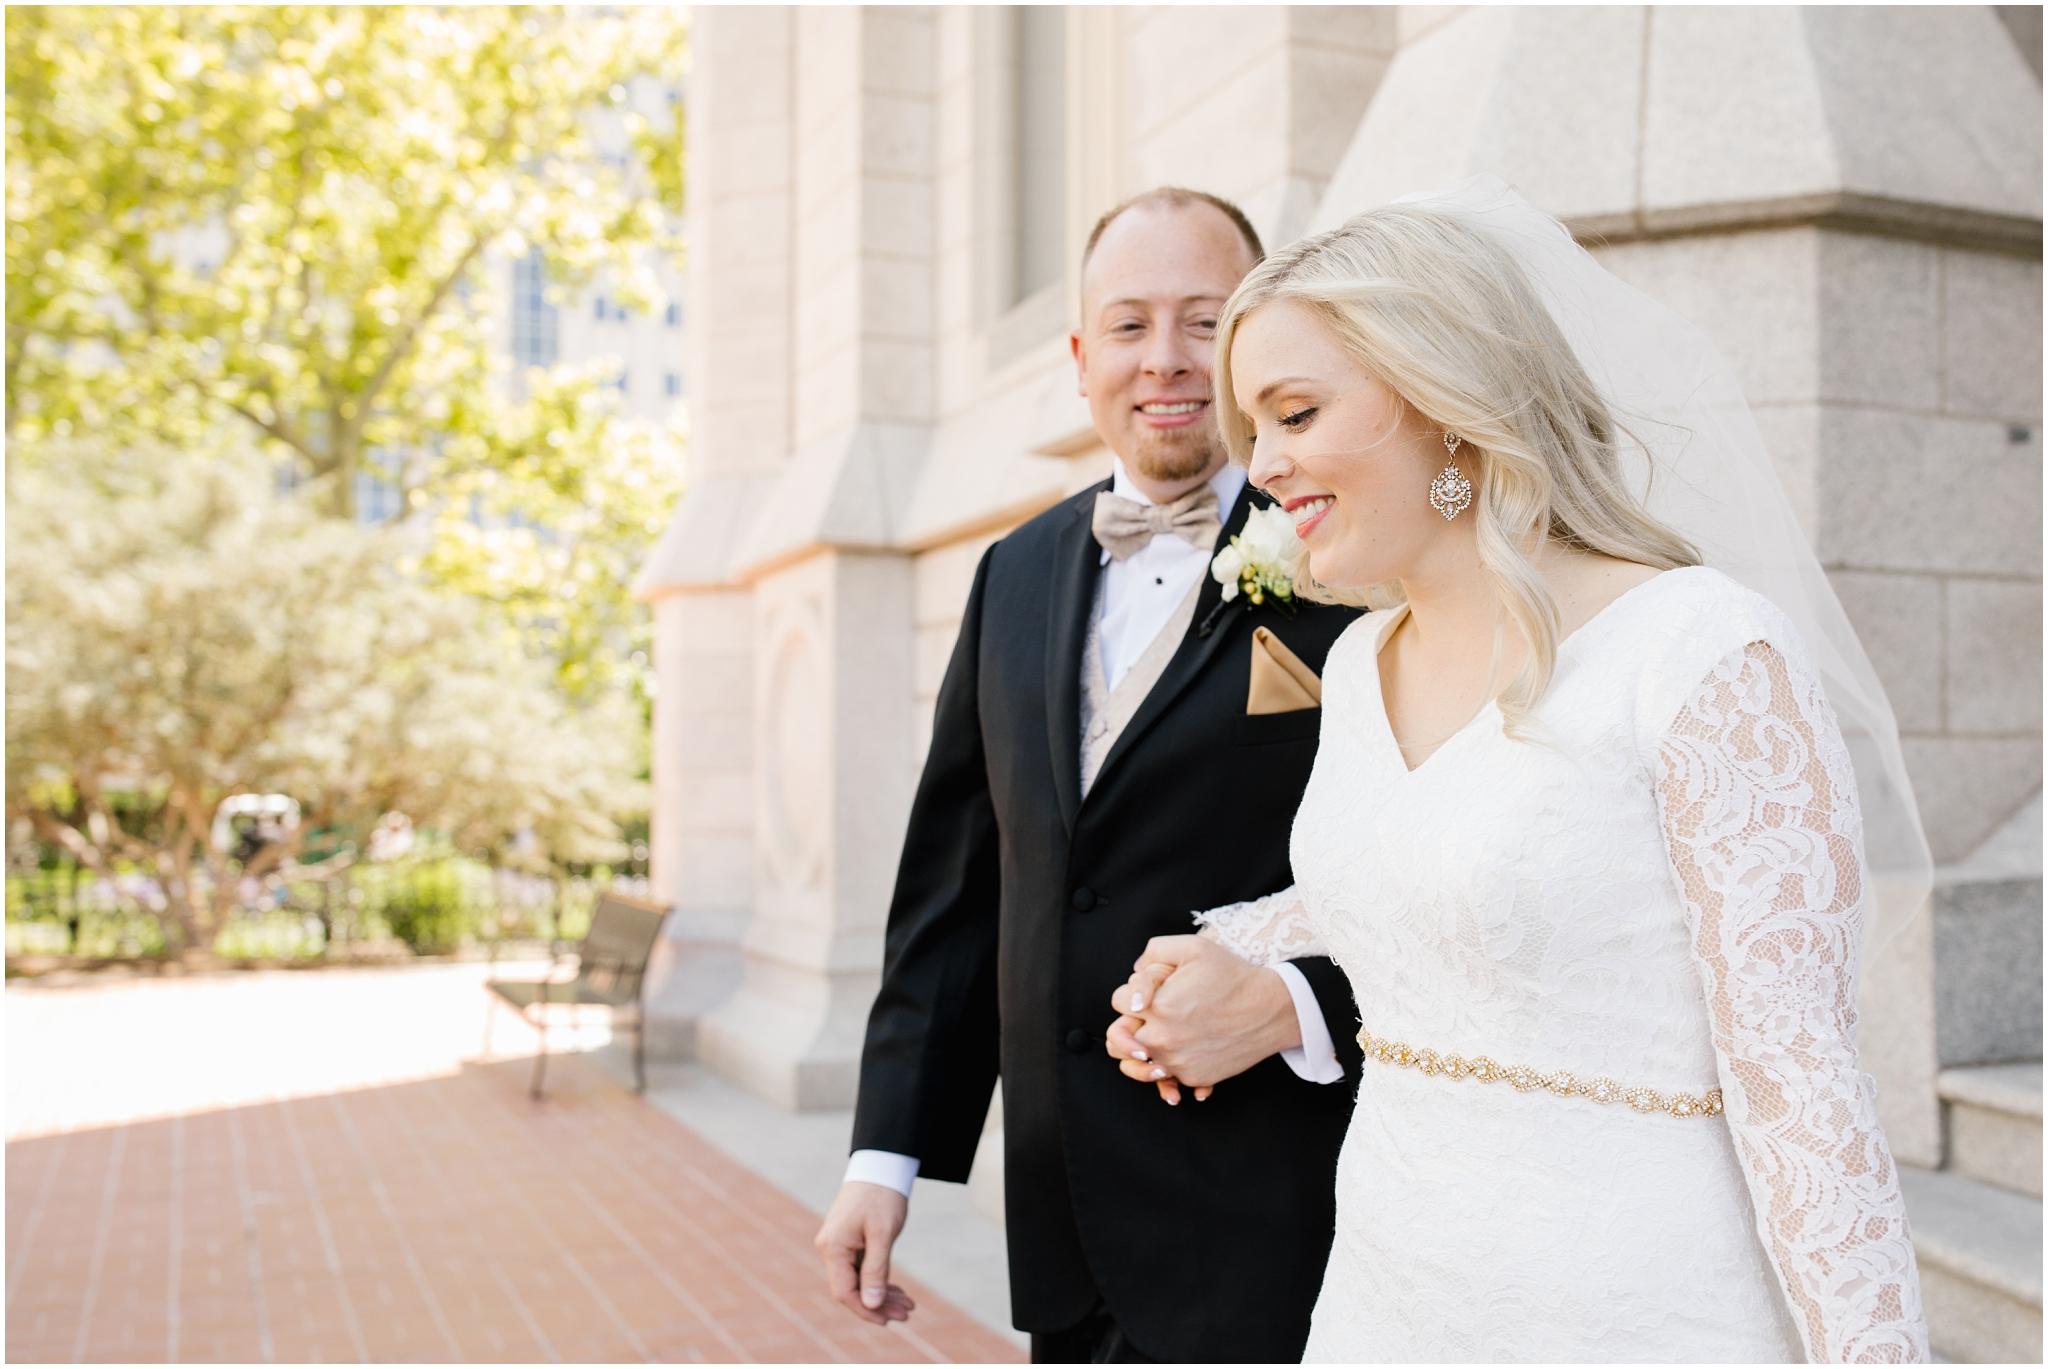 CherylandTyler-160_Lizzie-B-Imagery-Utah-Wedding-Photographer-Salt-Lake-City-Temple-Wells-Fargo-Building-Reception.jpg